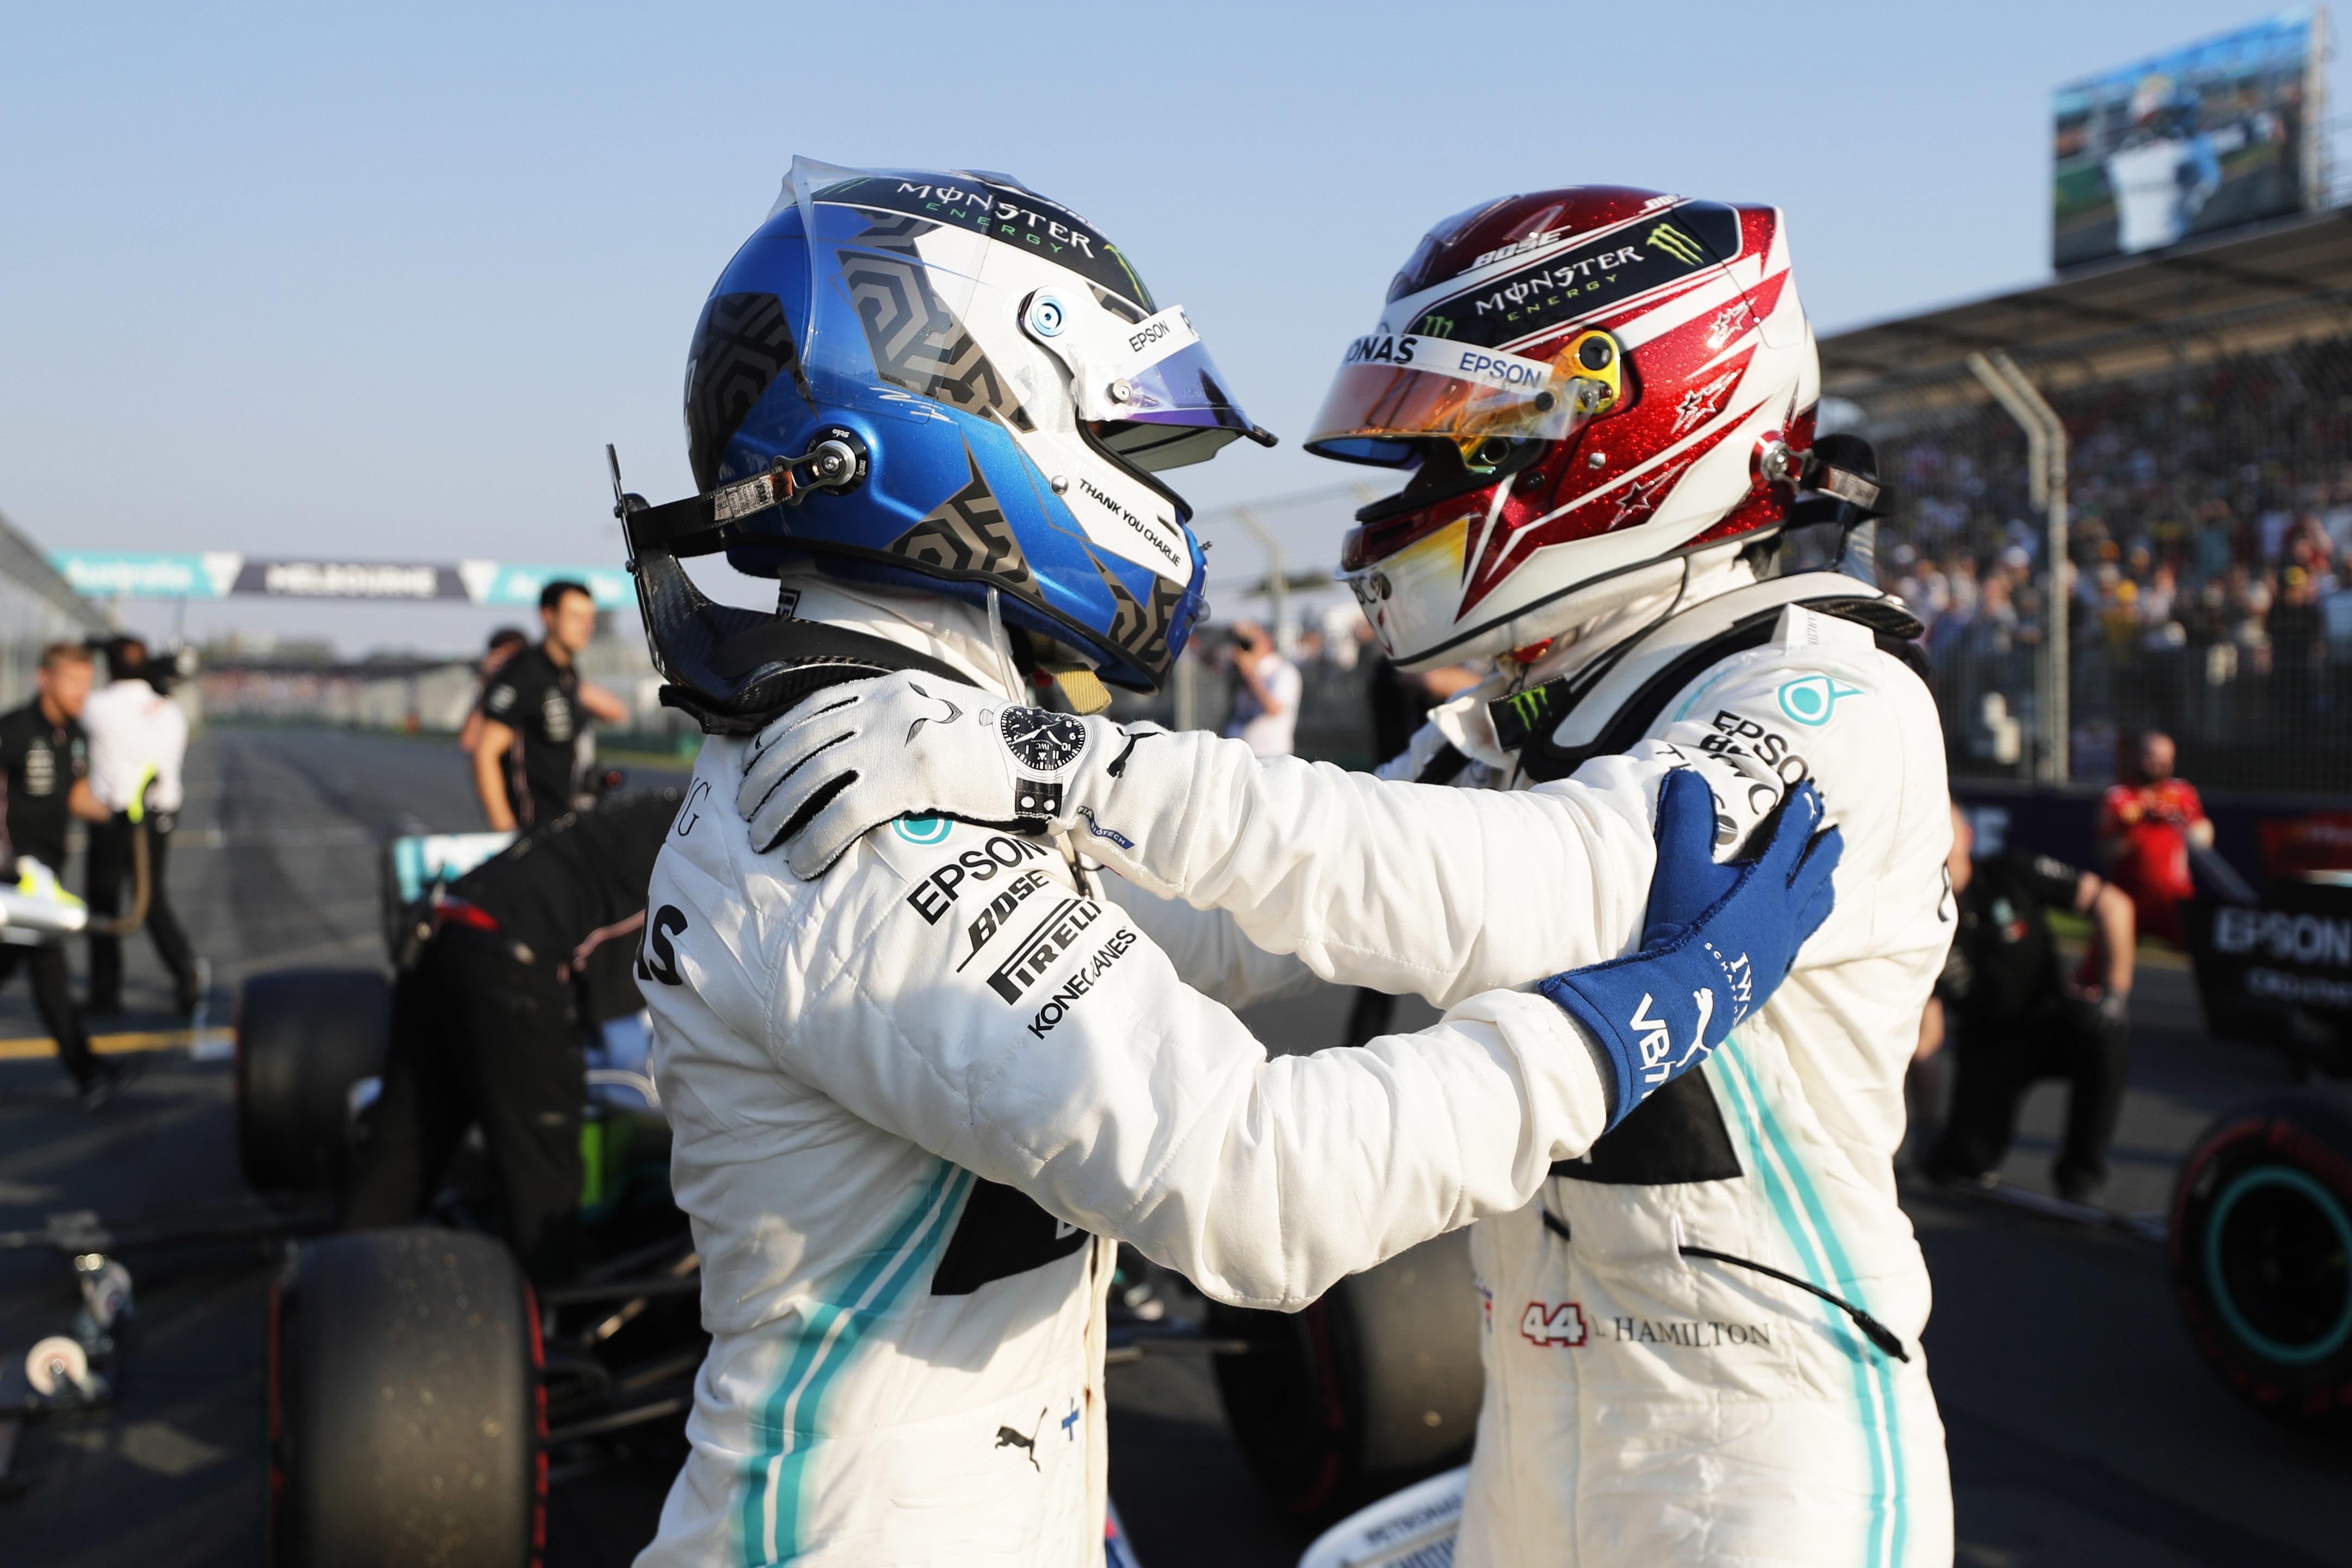 Hamilton says new engineer boosting Bottas